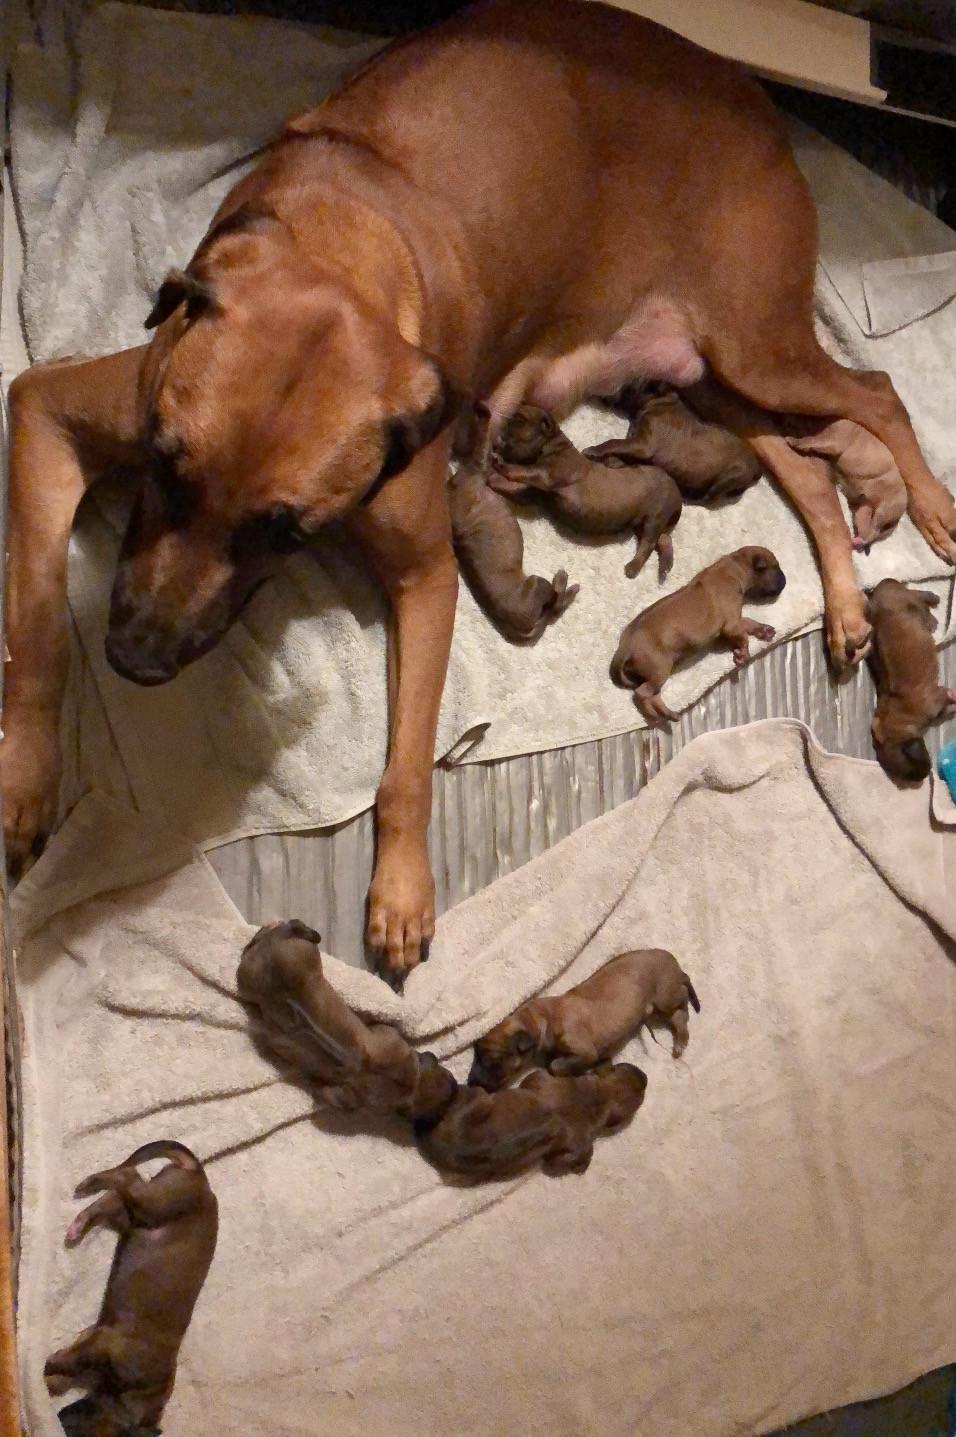 Rafiki gave birth to 10 beautiful pups (5 girls and 5 boys).